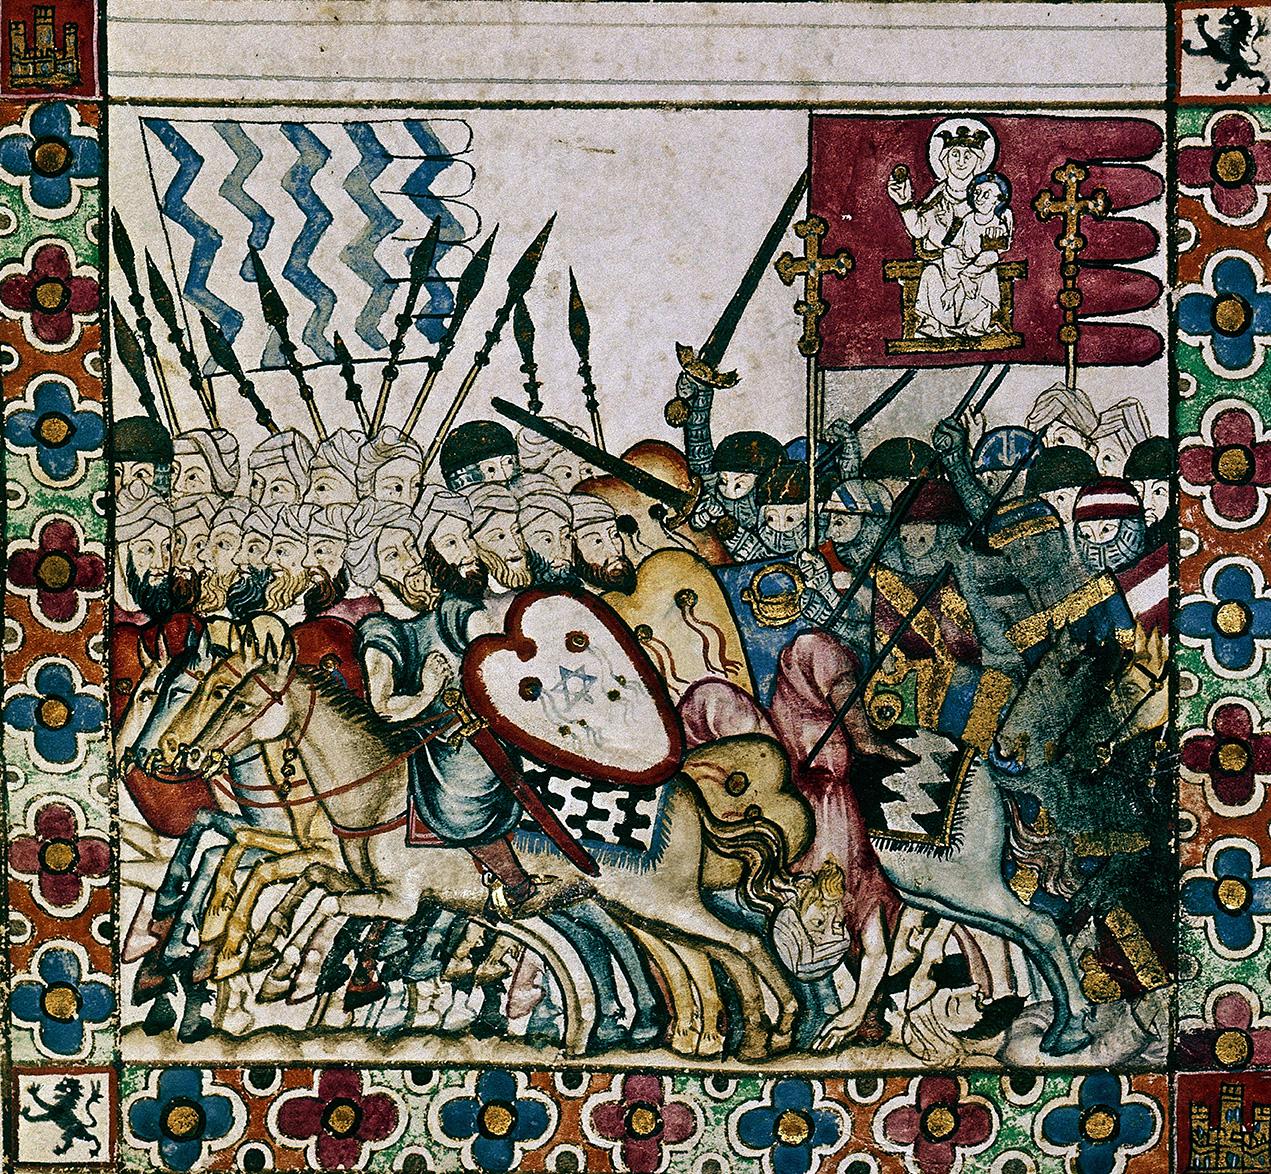 Moroccan army of Caliph Umar al-Murtada